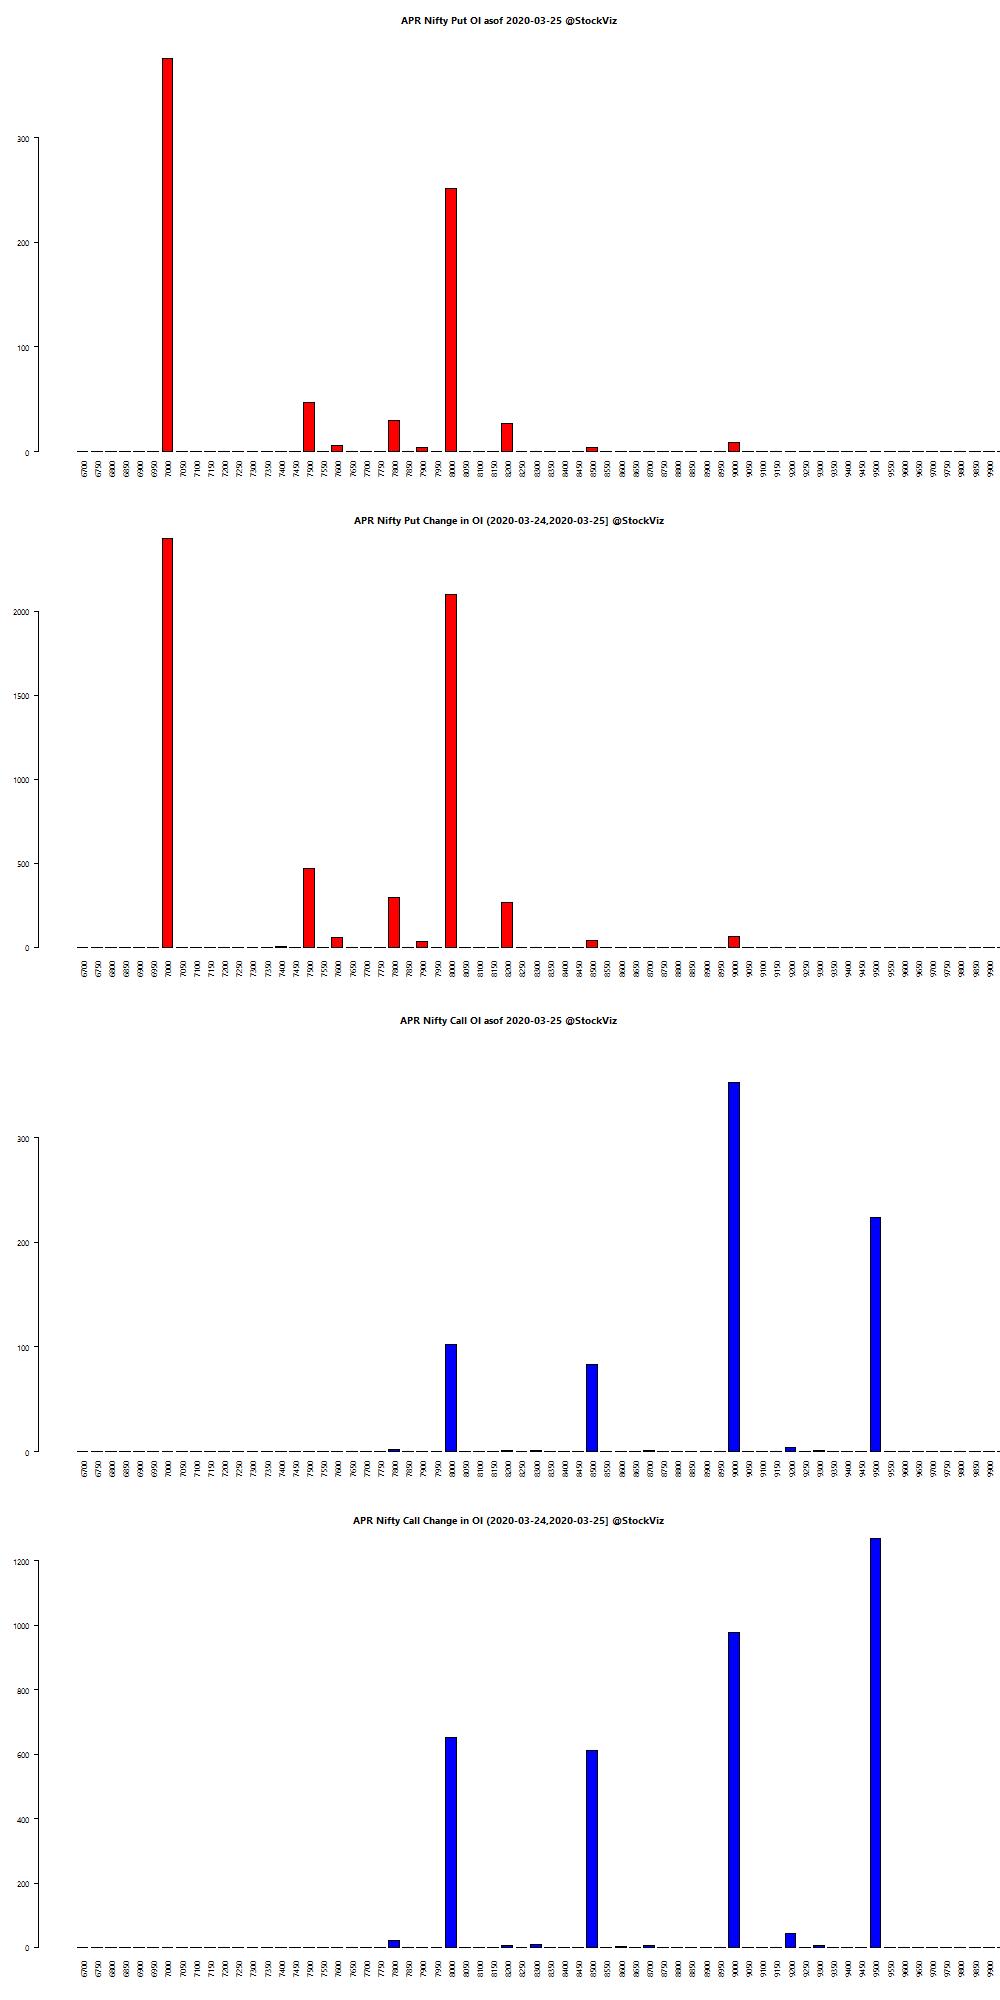 APR NIFTY OI chart